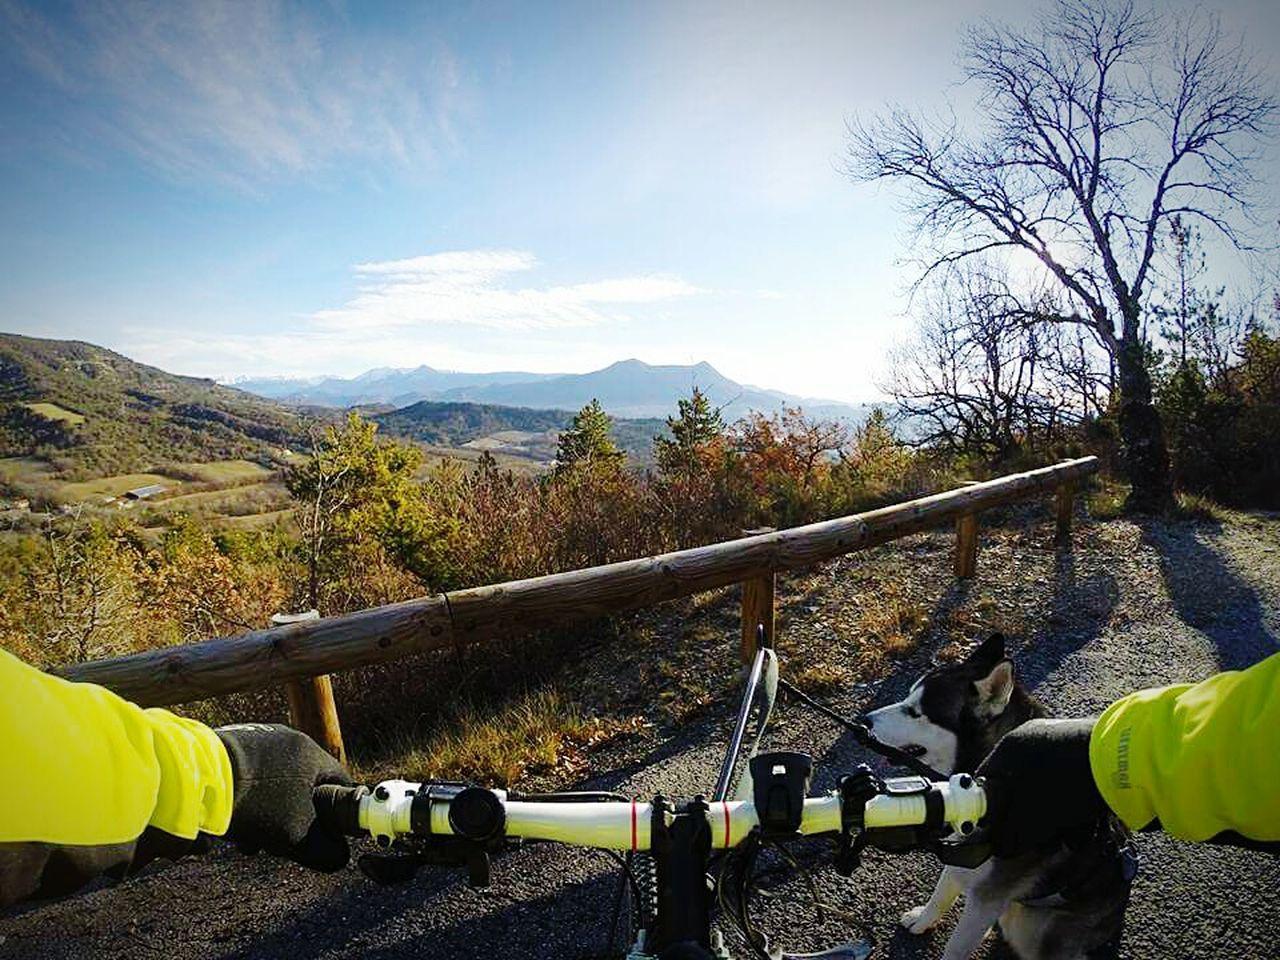 Sky Day Dog Husky Cousson Provence Alpes Cote D´Azur PACA Pacatourisme VTT Canivtt Mountain Eyeemvision Animal